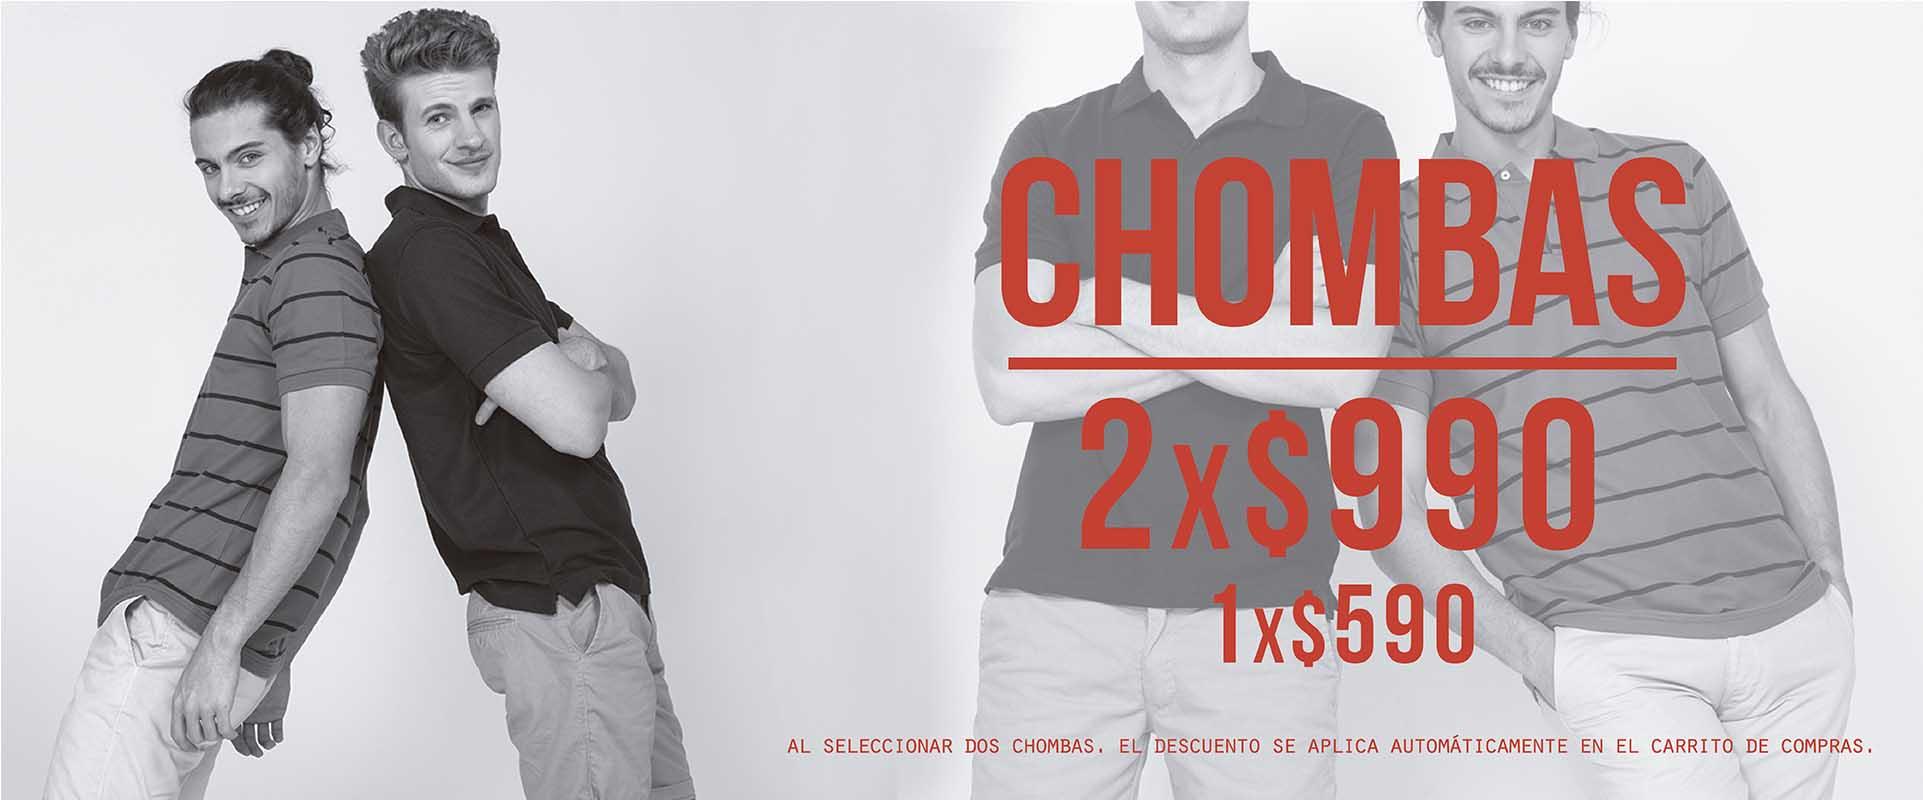 Chombas